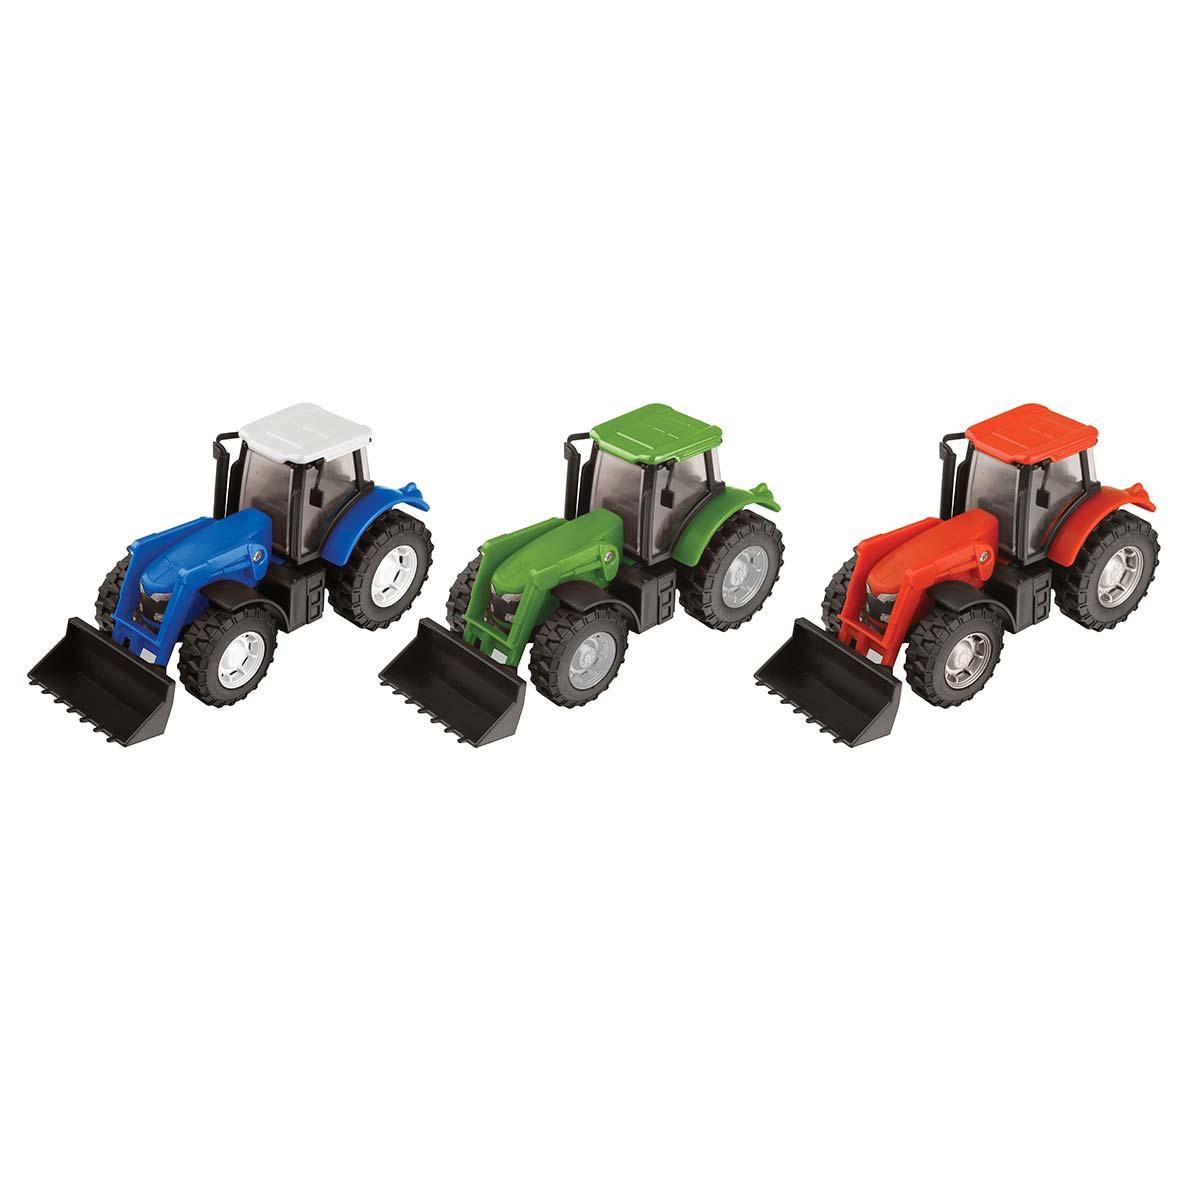 Teamsterz Farm Traktor